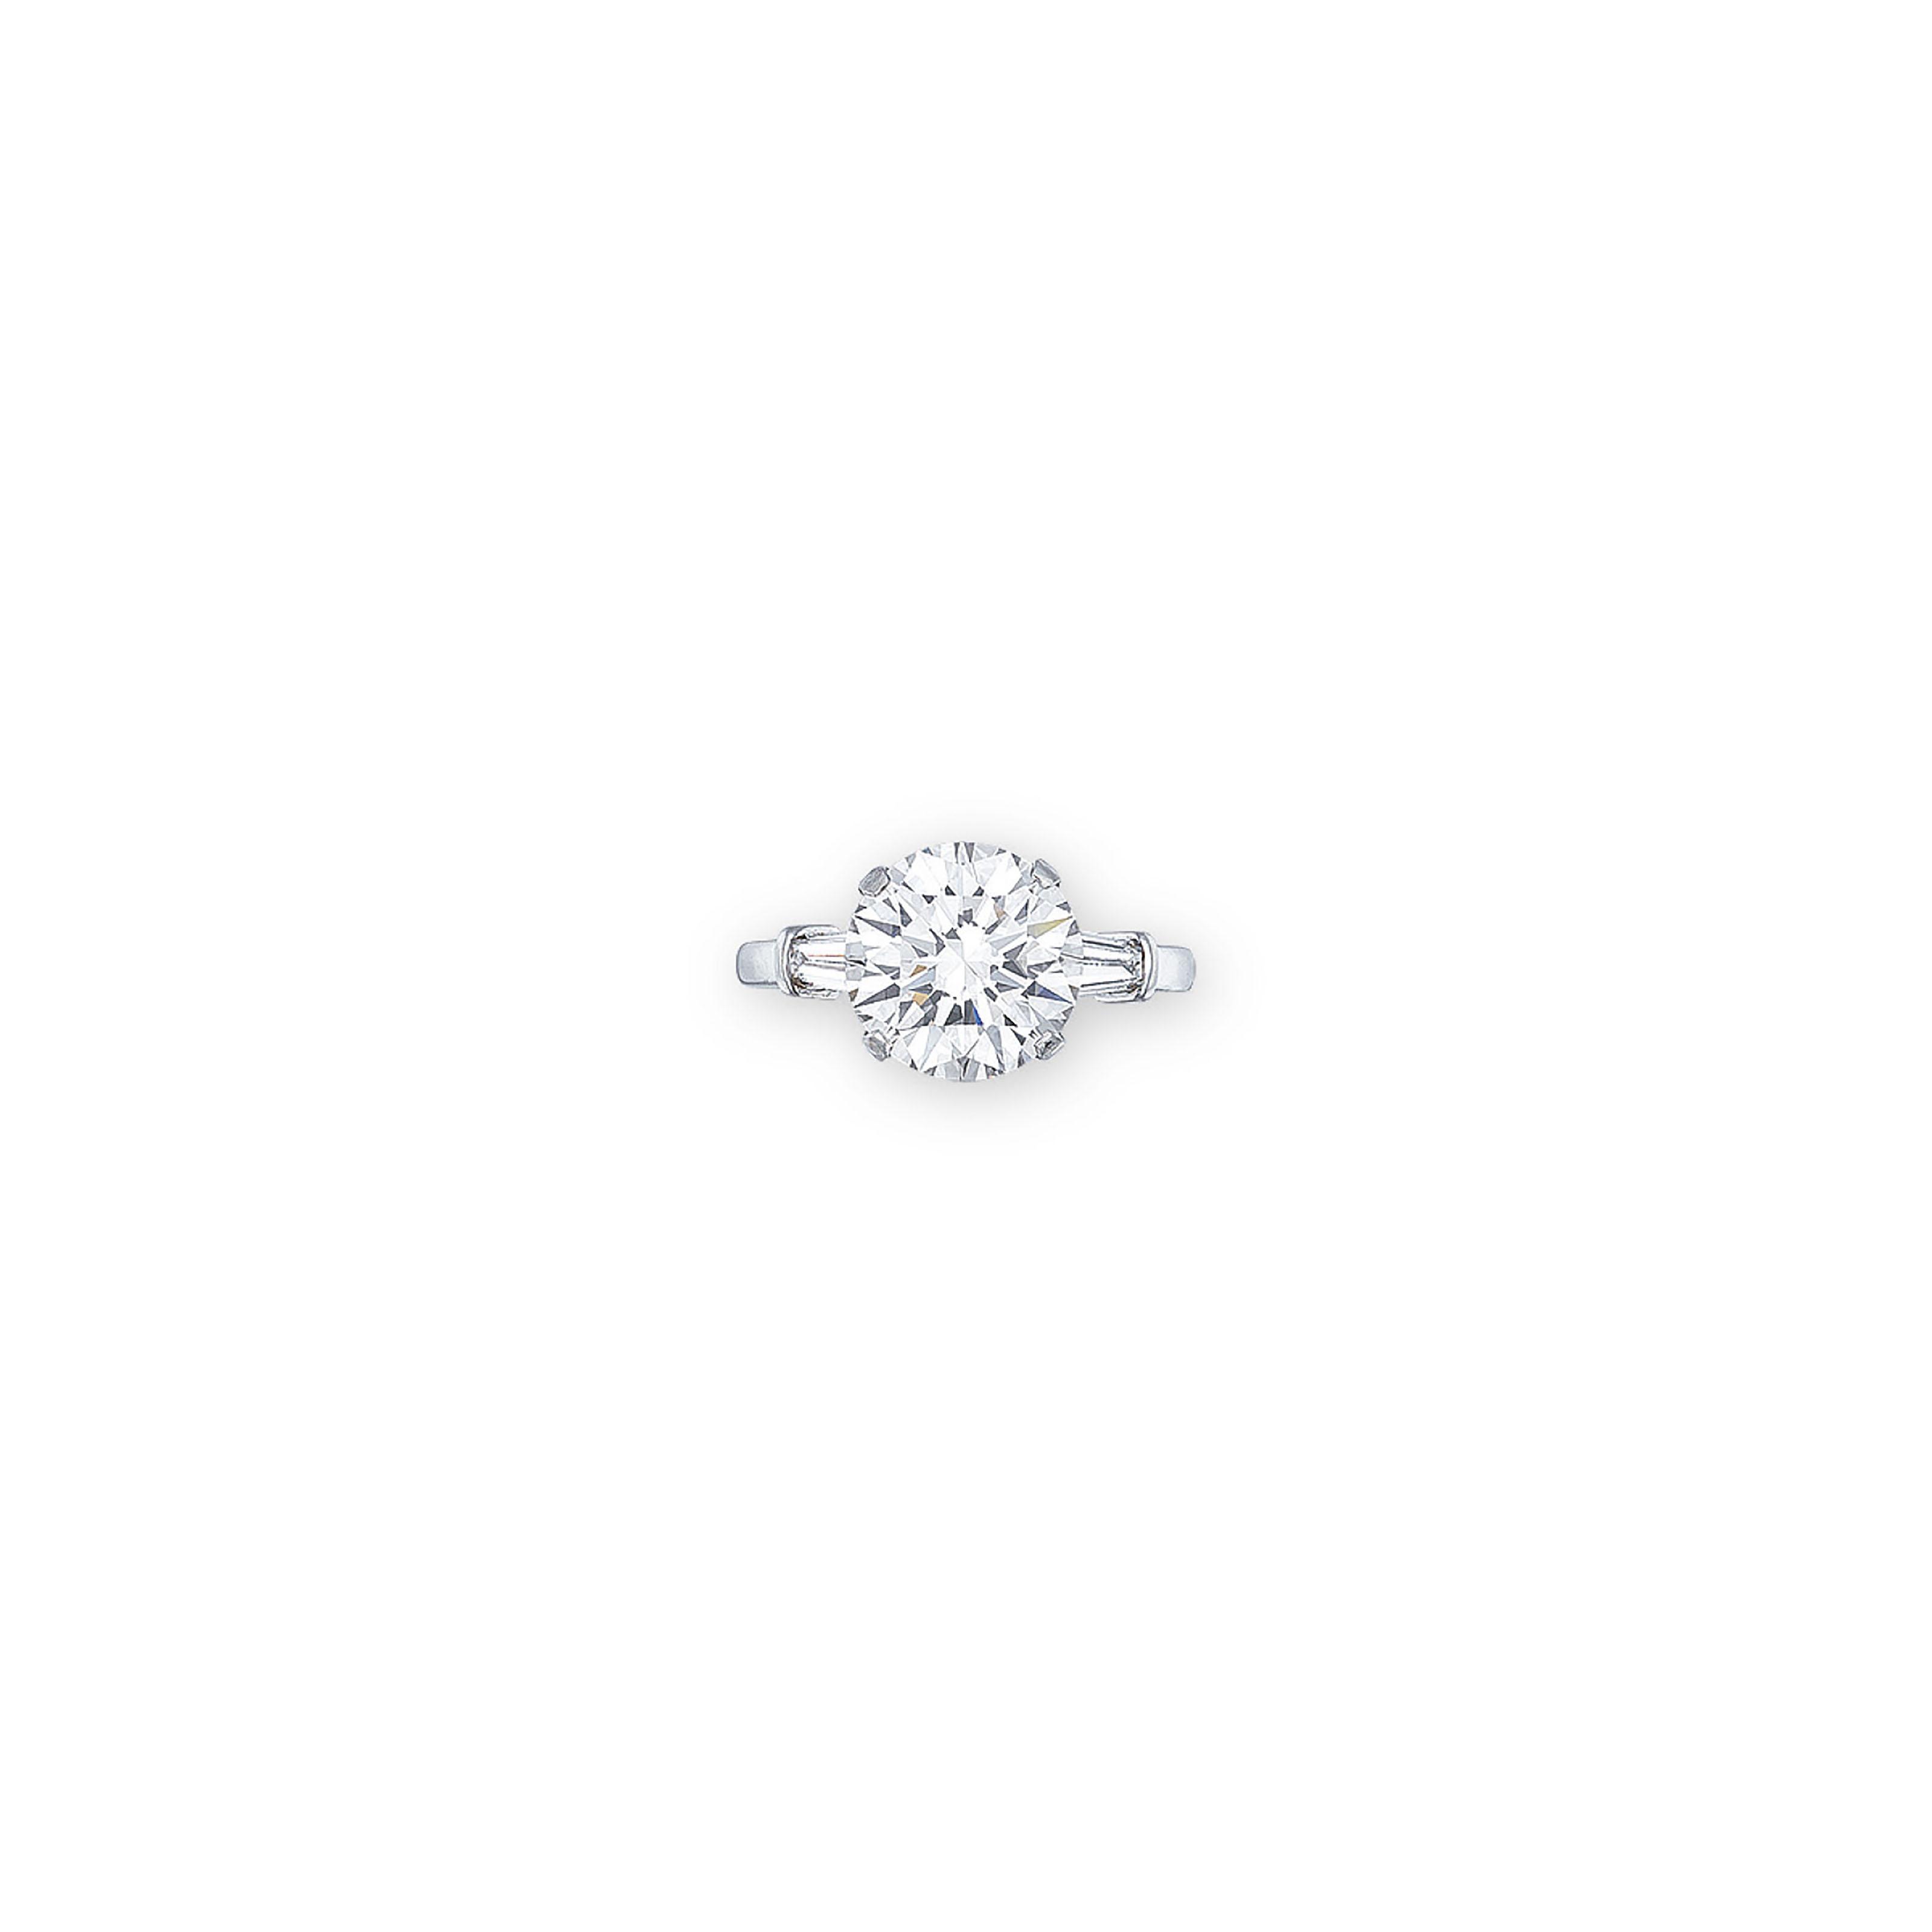 A DIAMOND RING, BY MIKIMOTO